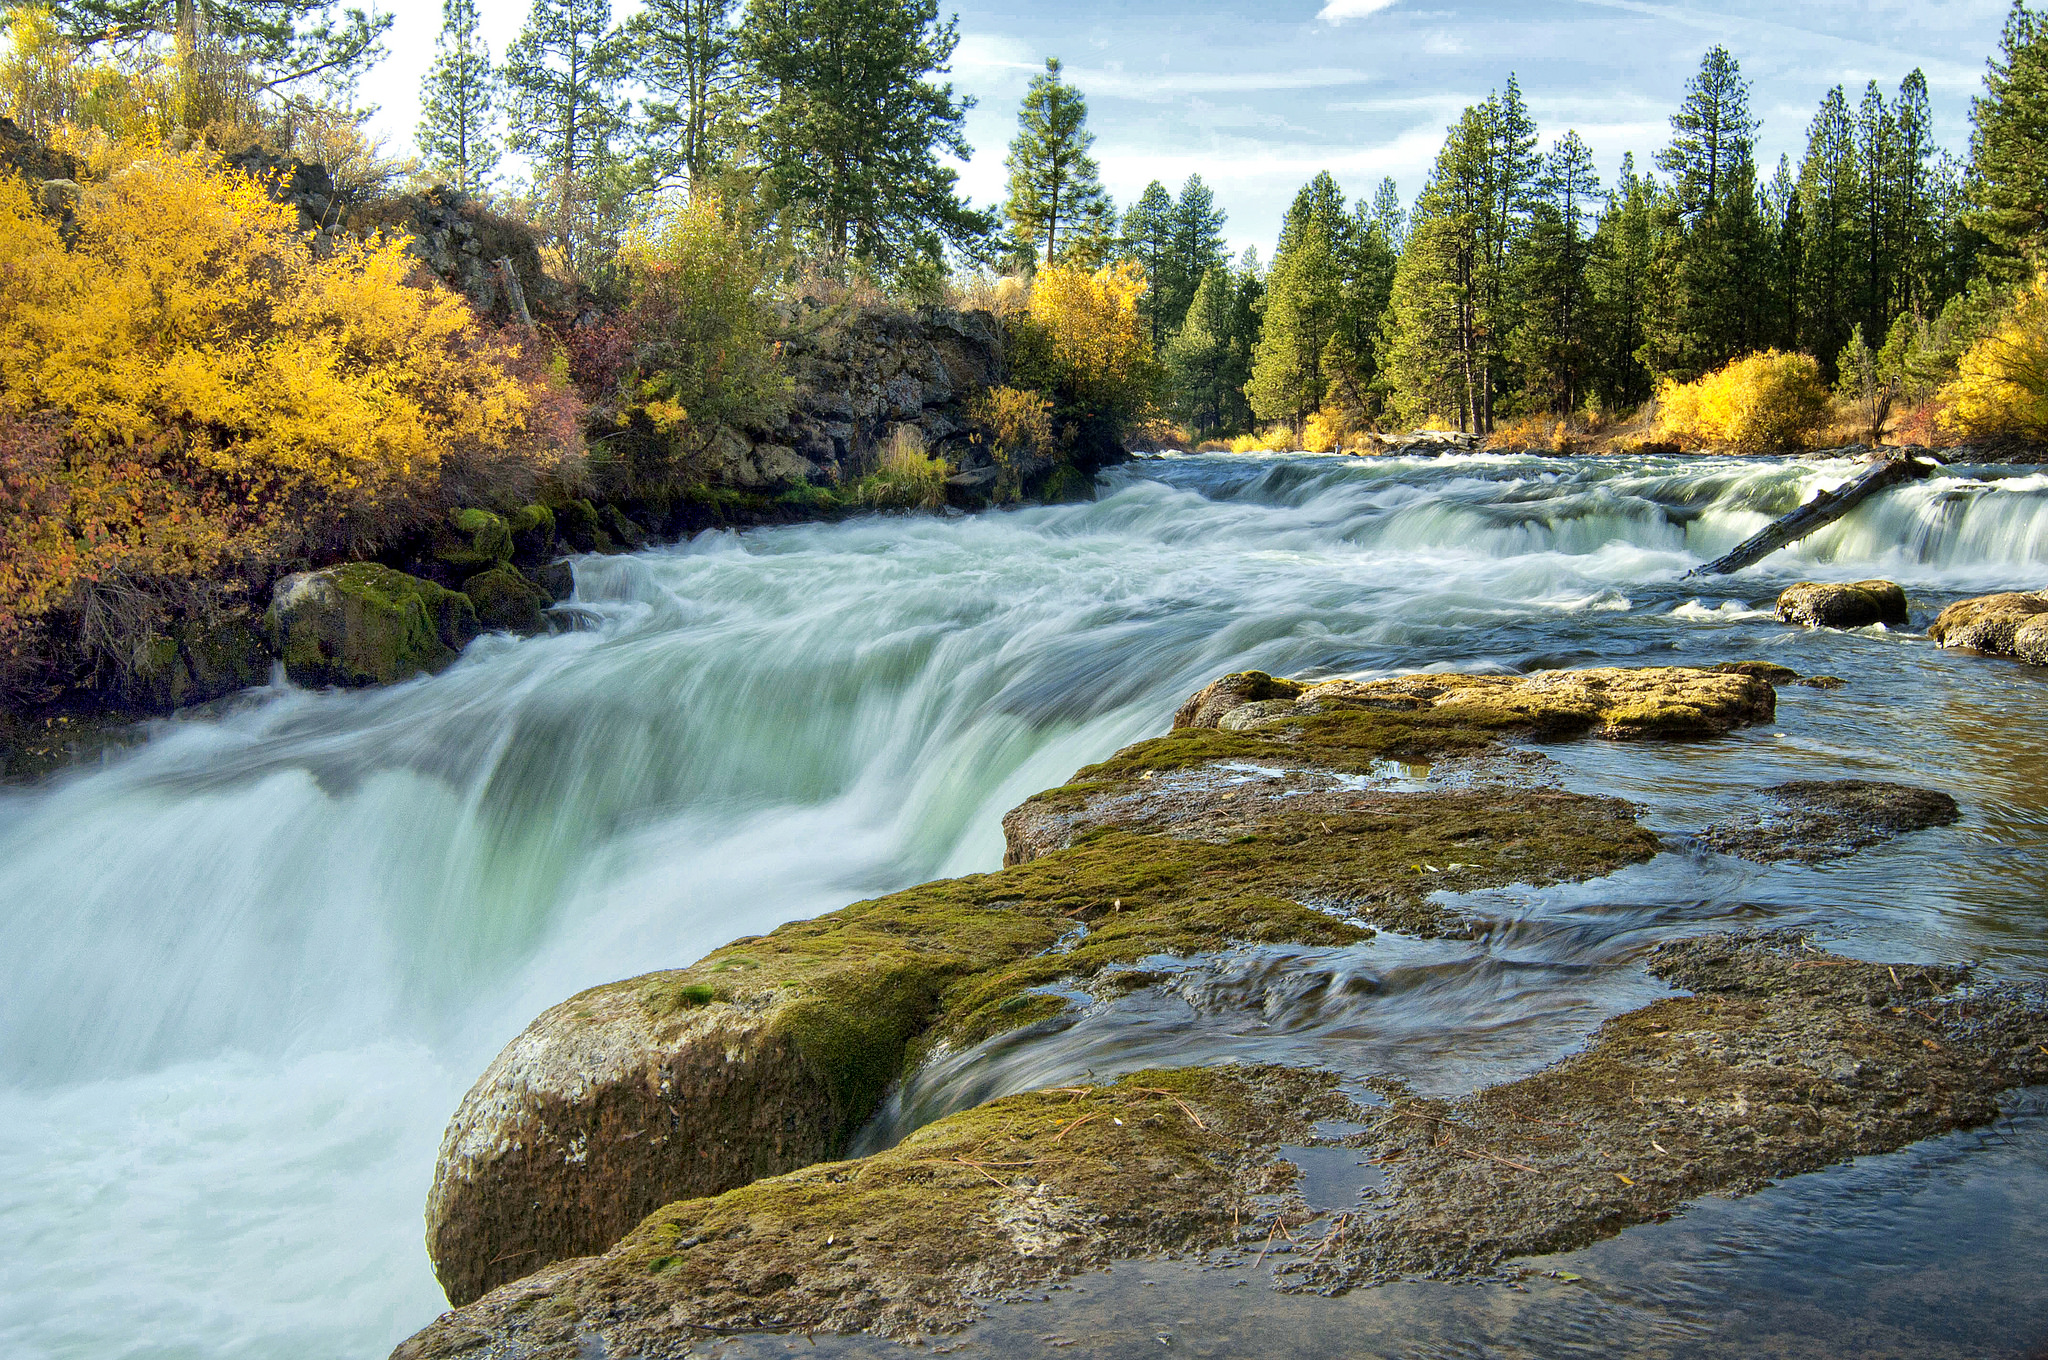 Photo: U.S. Forest service